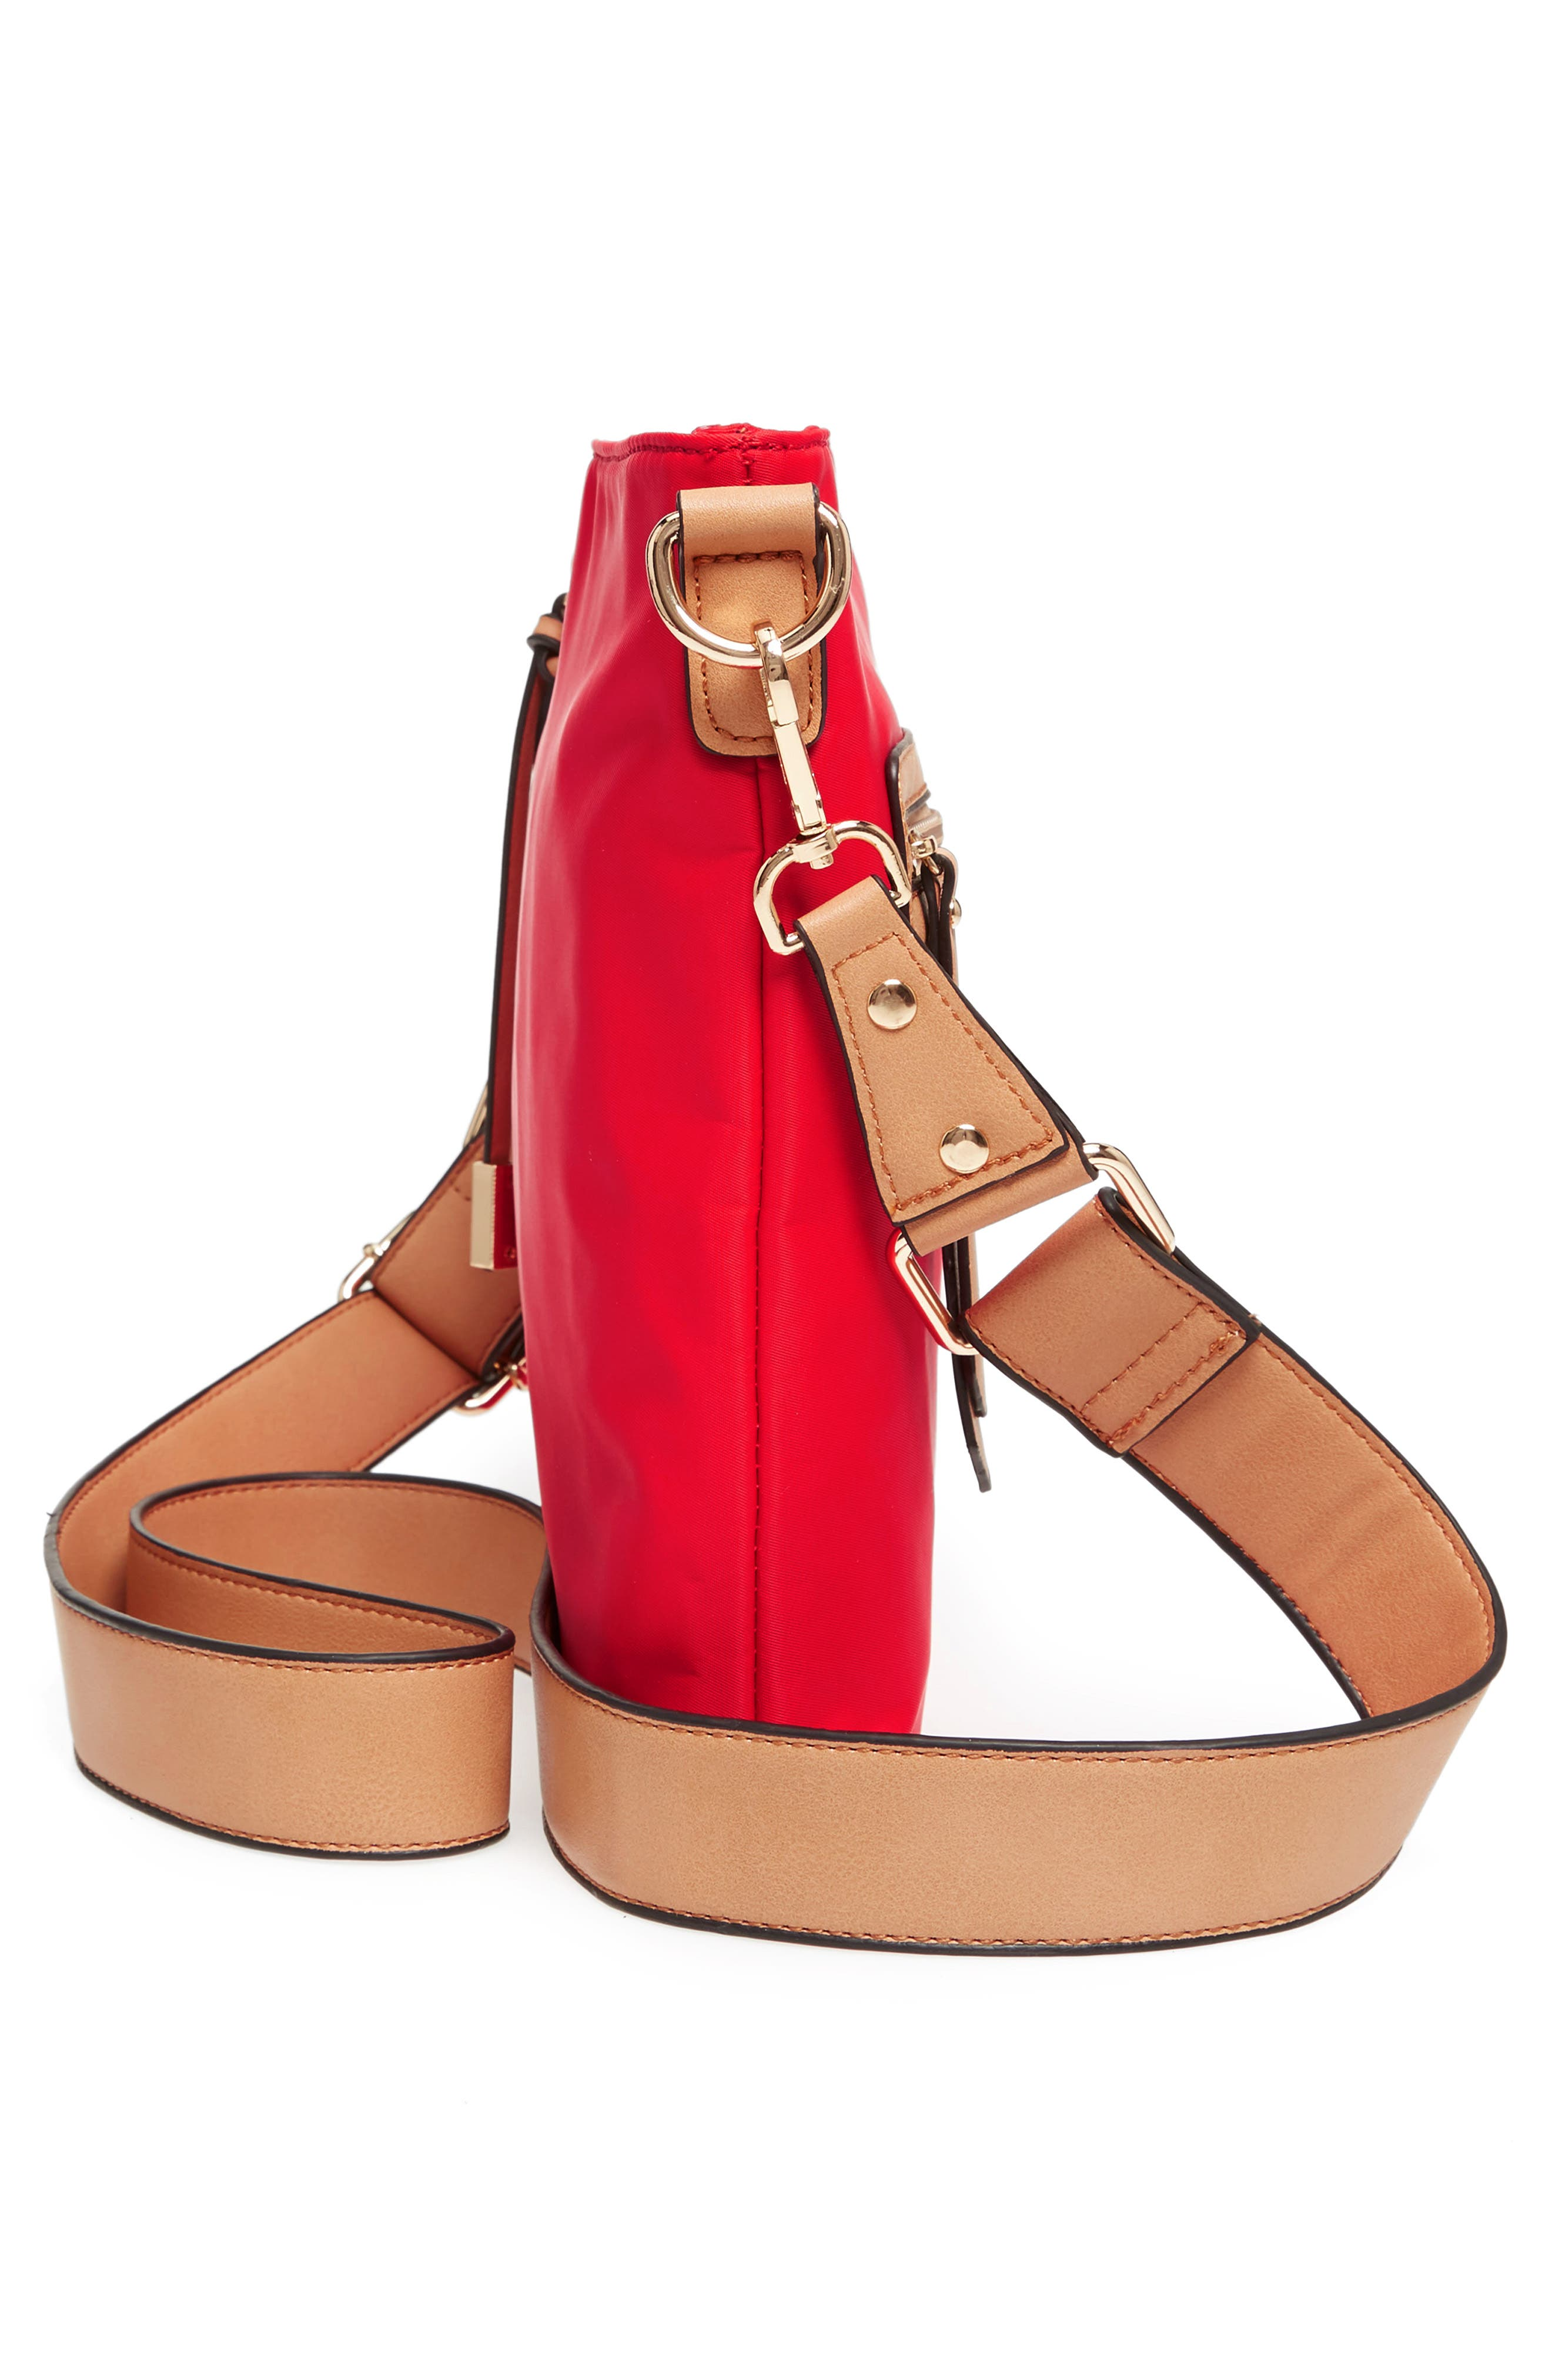 Guitar Strap Crossbody Bag,                             Alternate thumbnail 5, color,                             Red